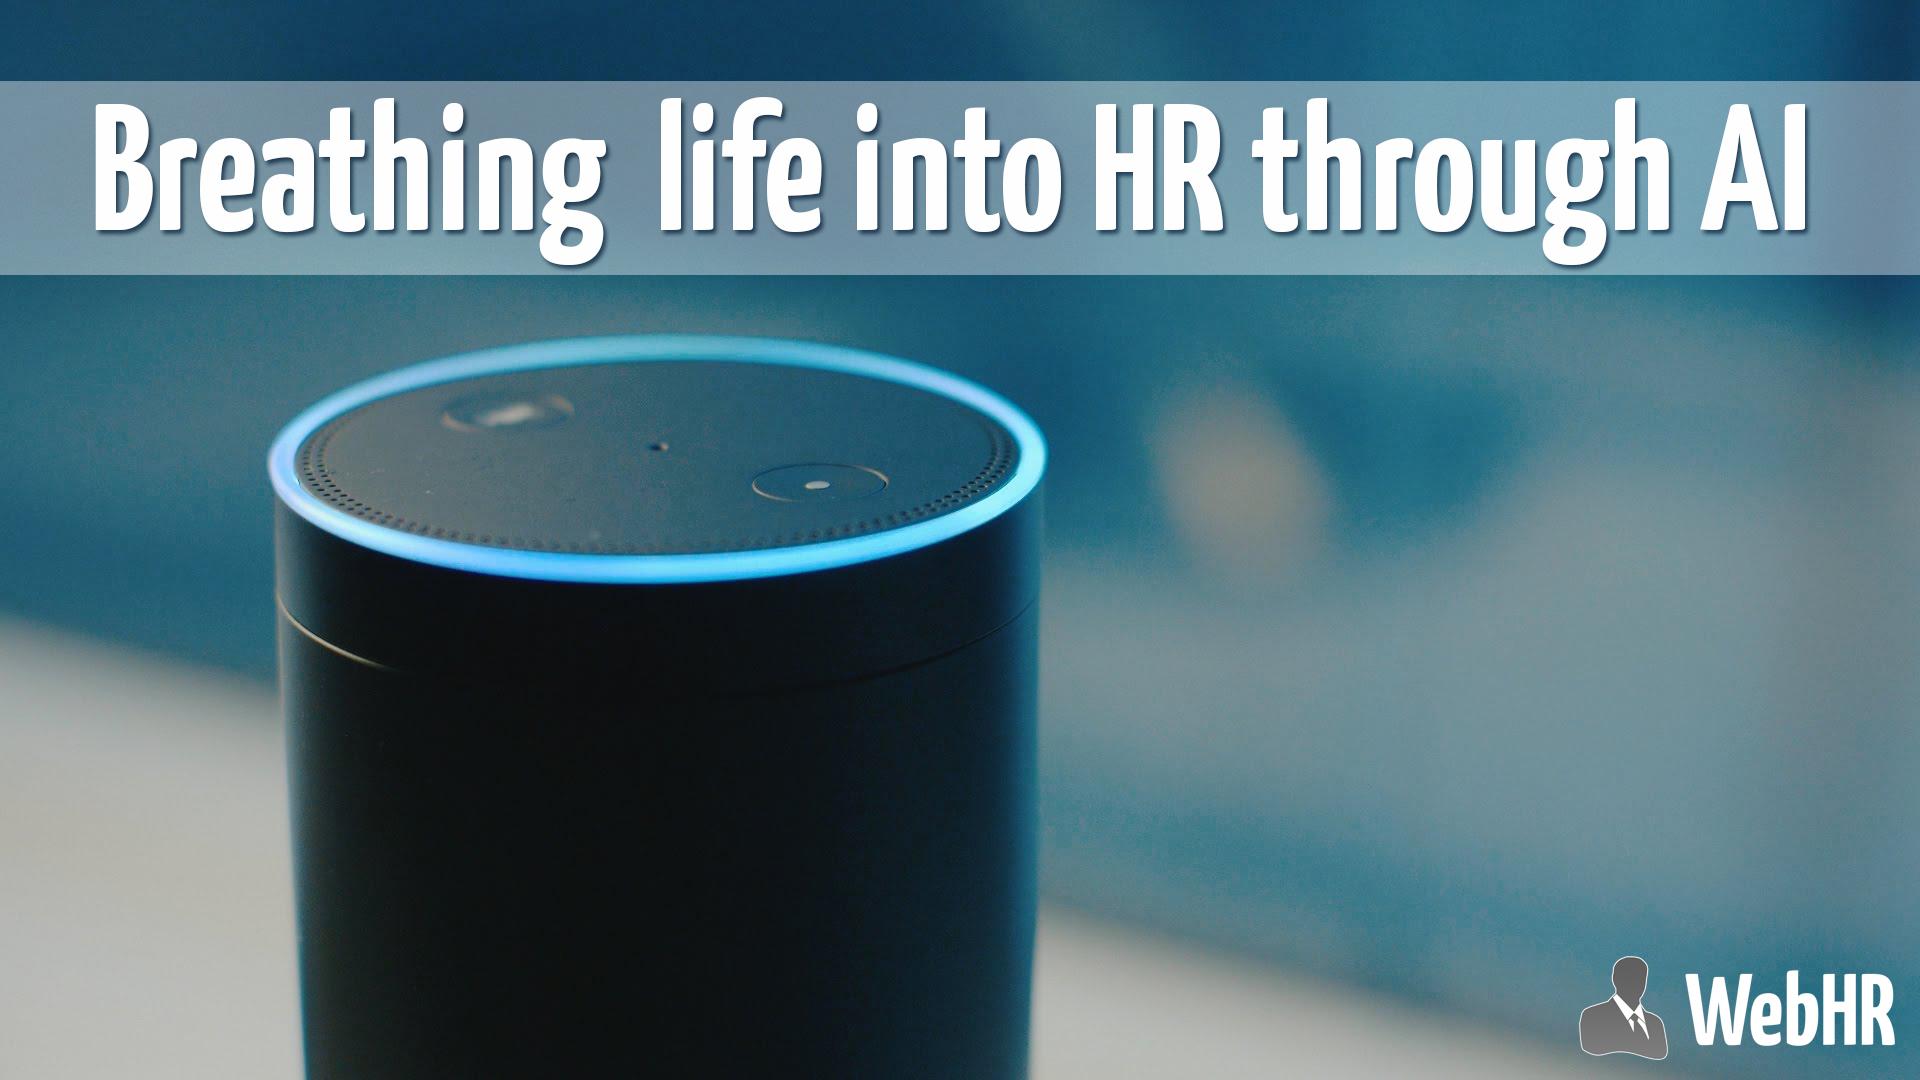 Breathing life into HR through AI